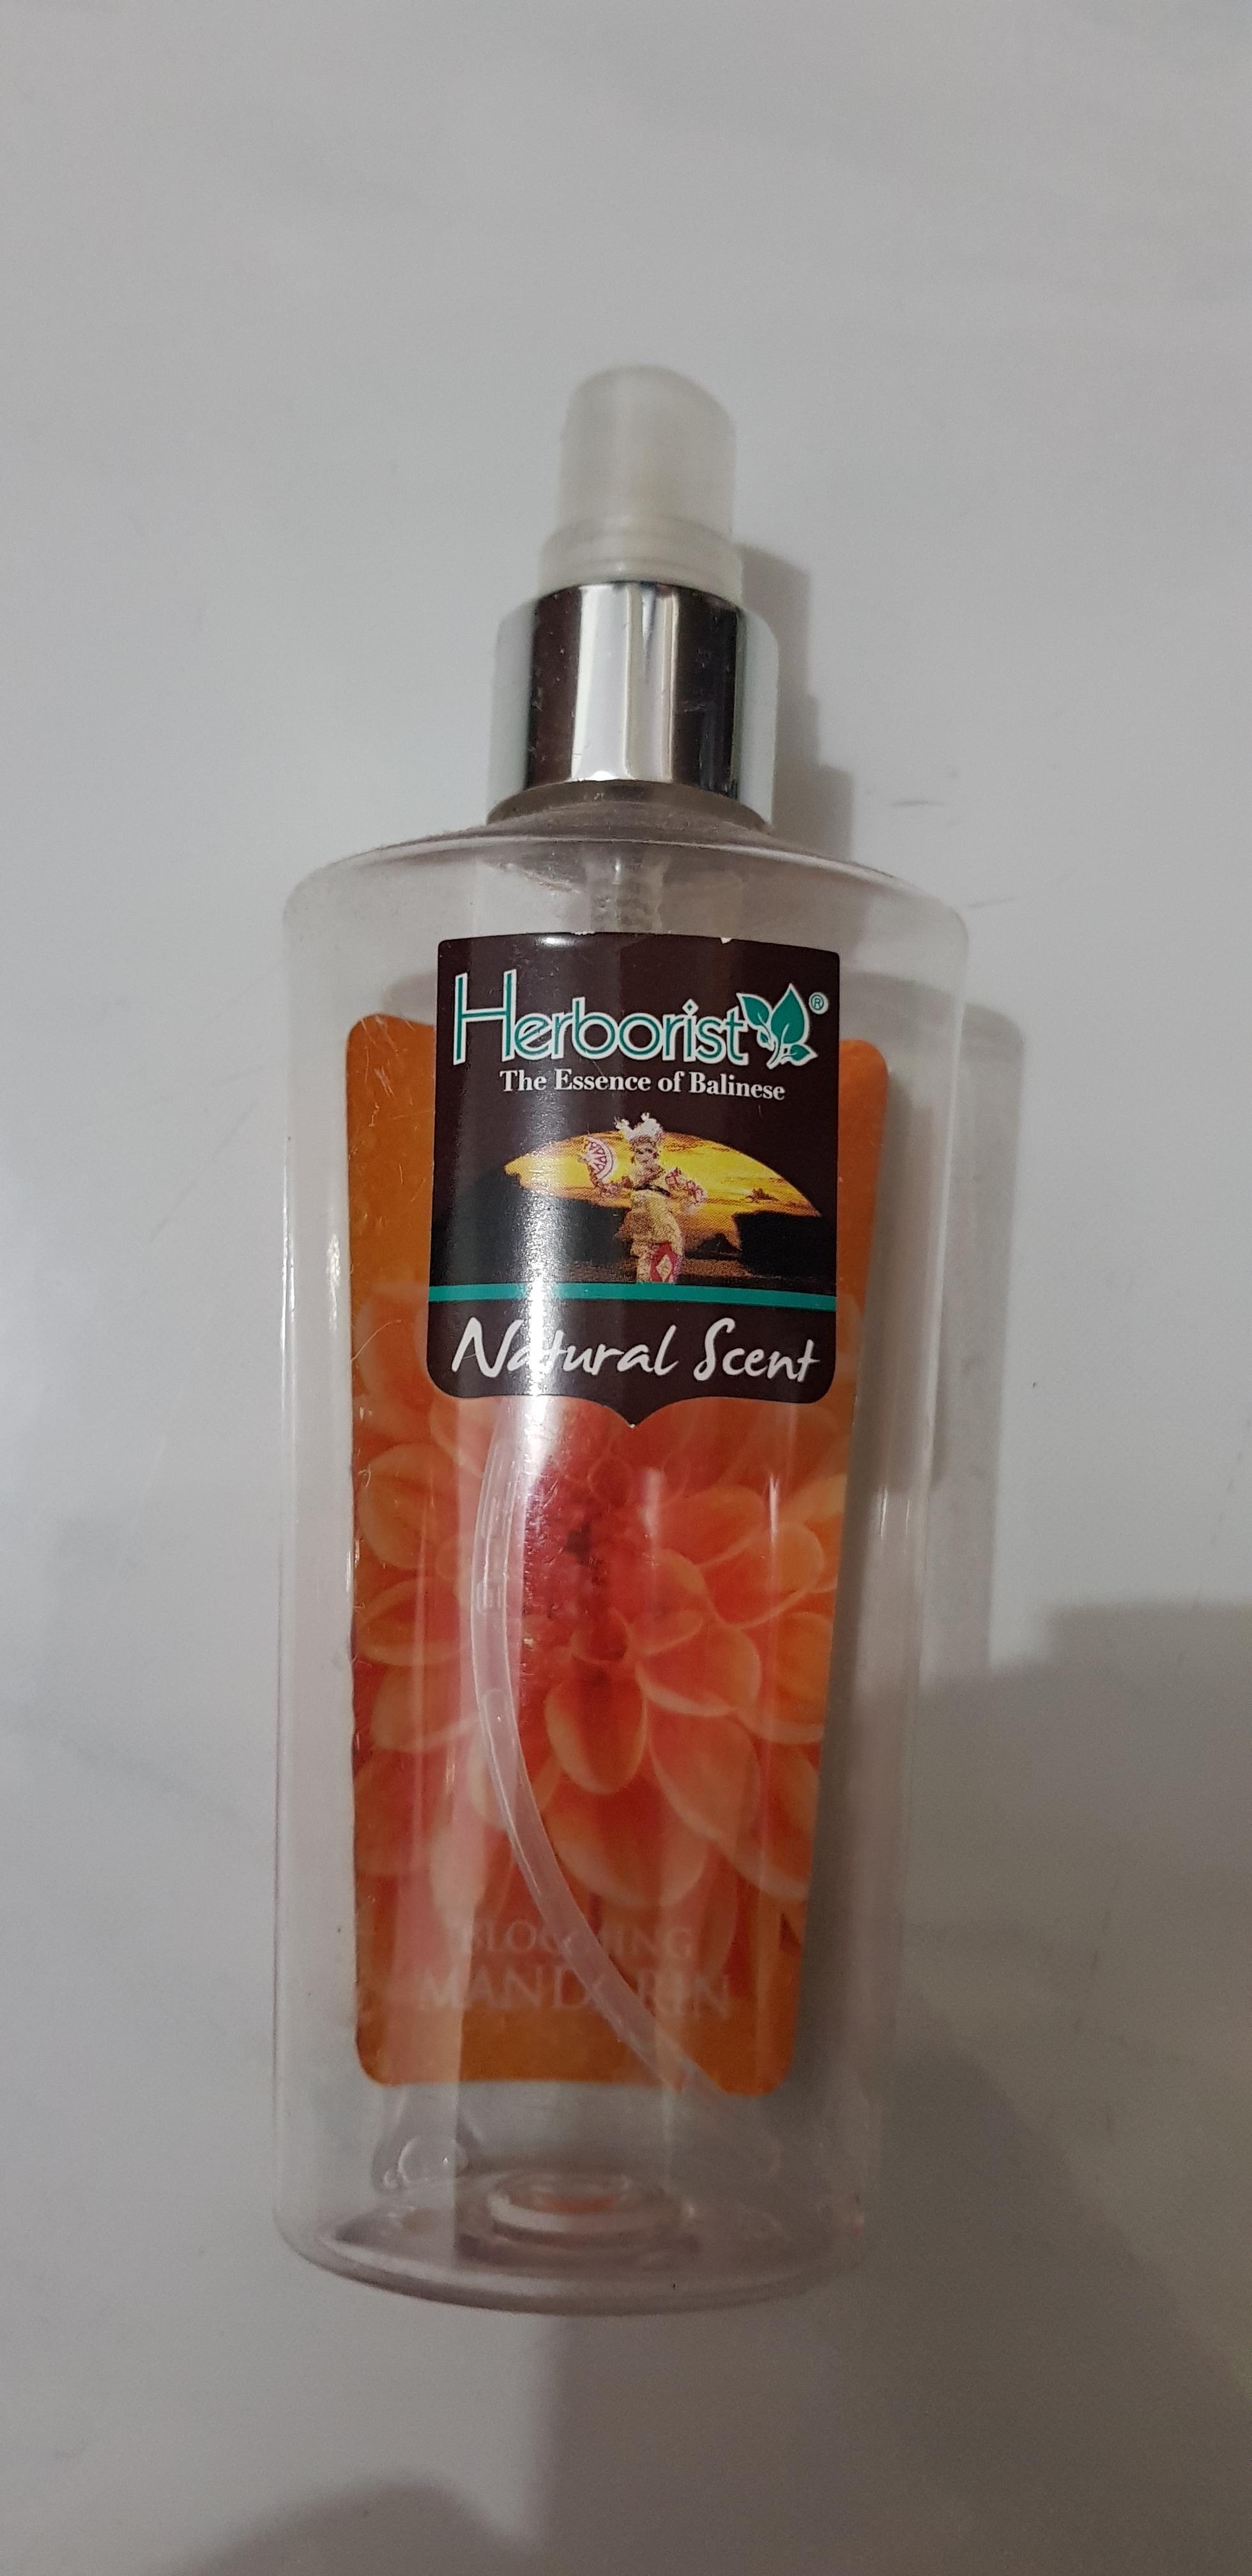 Herborist Natural Scent